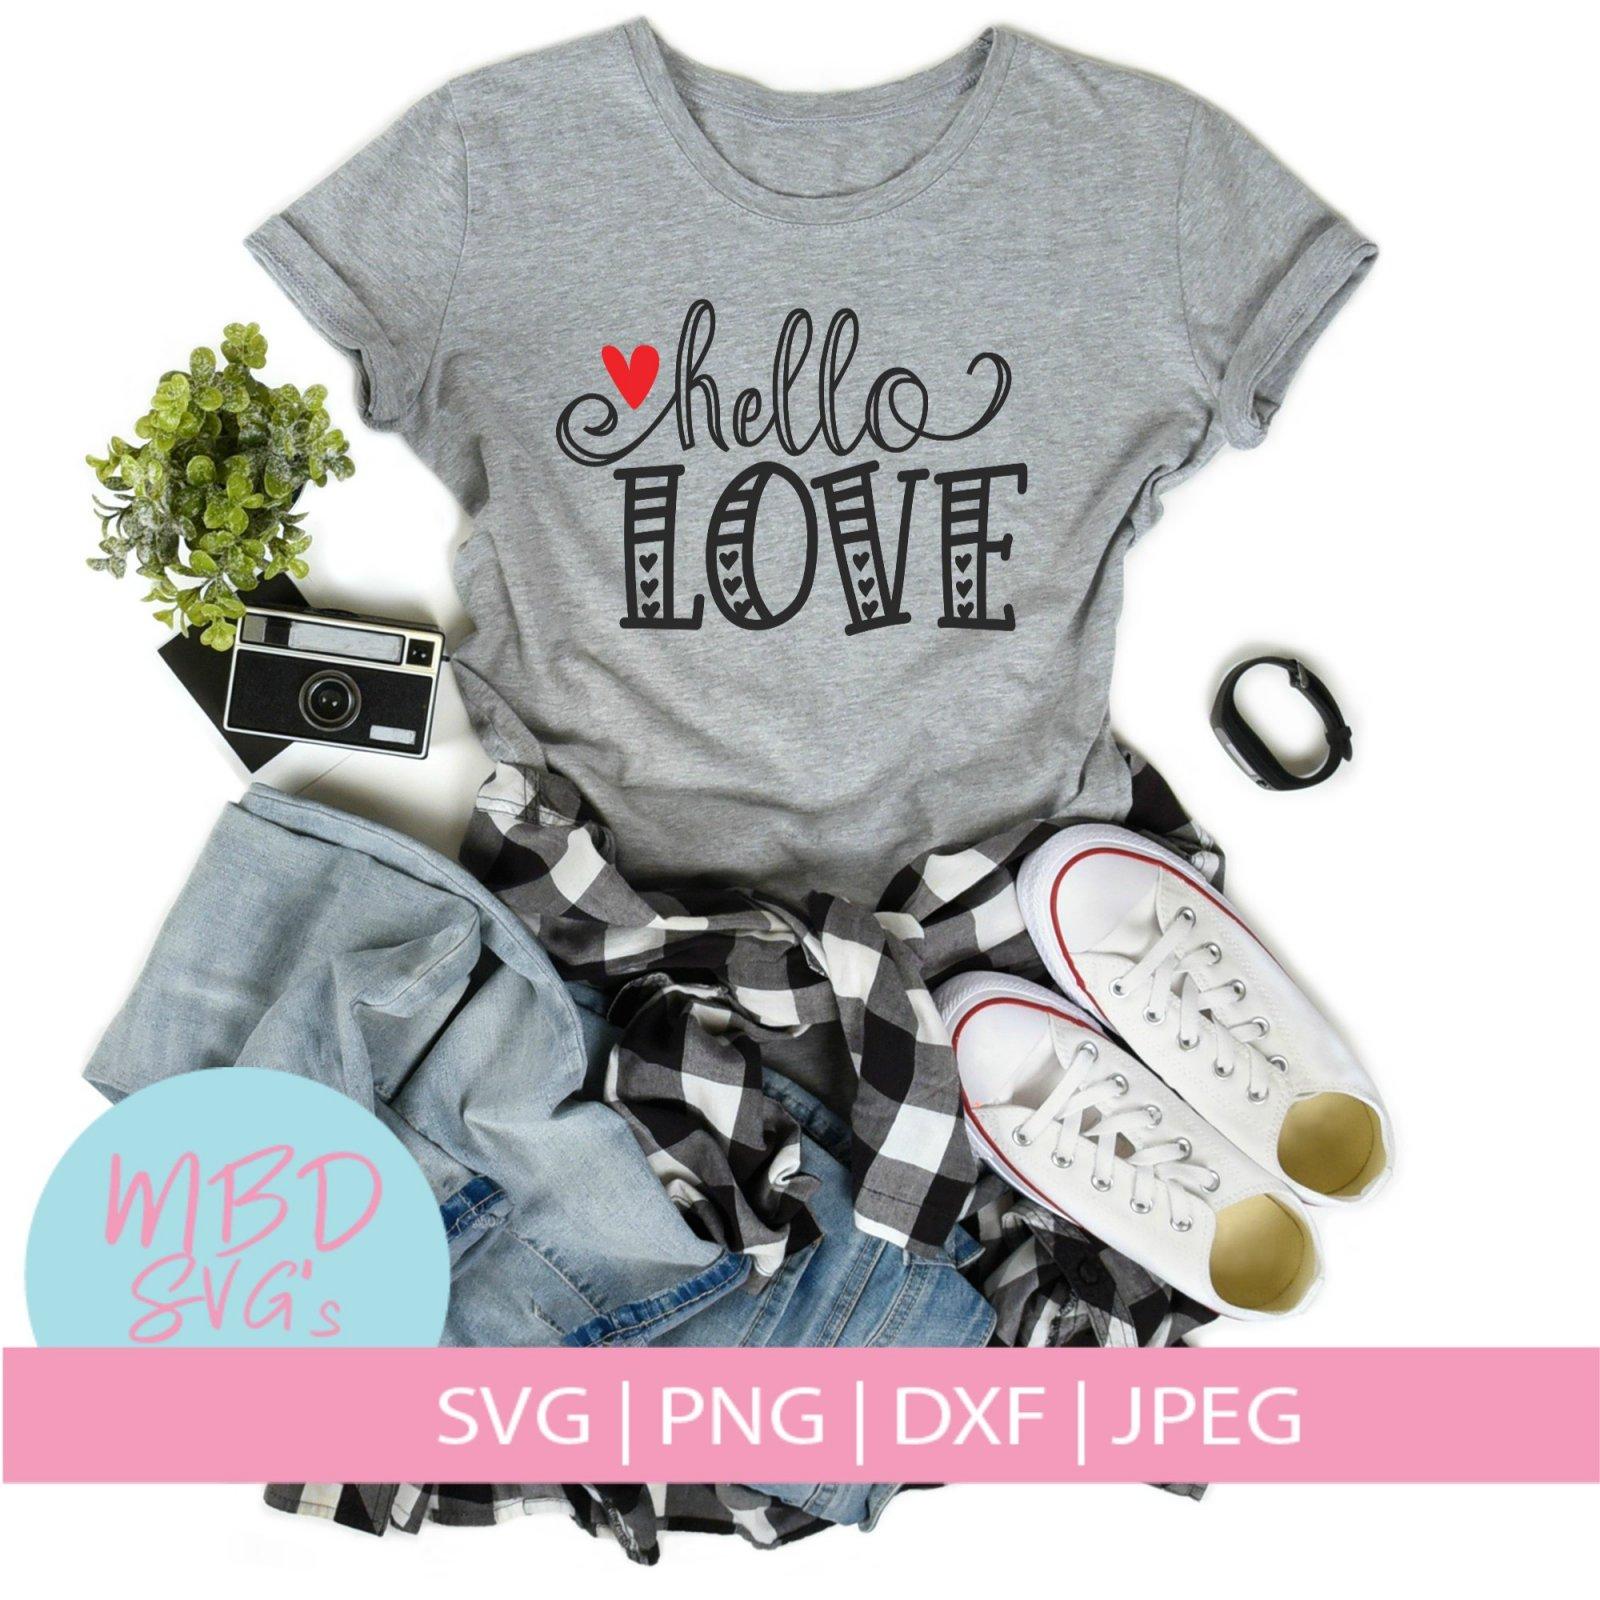 Valentines Day SVG Cut File for Silhouette or Cricut - Hello Love